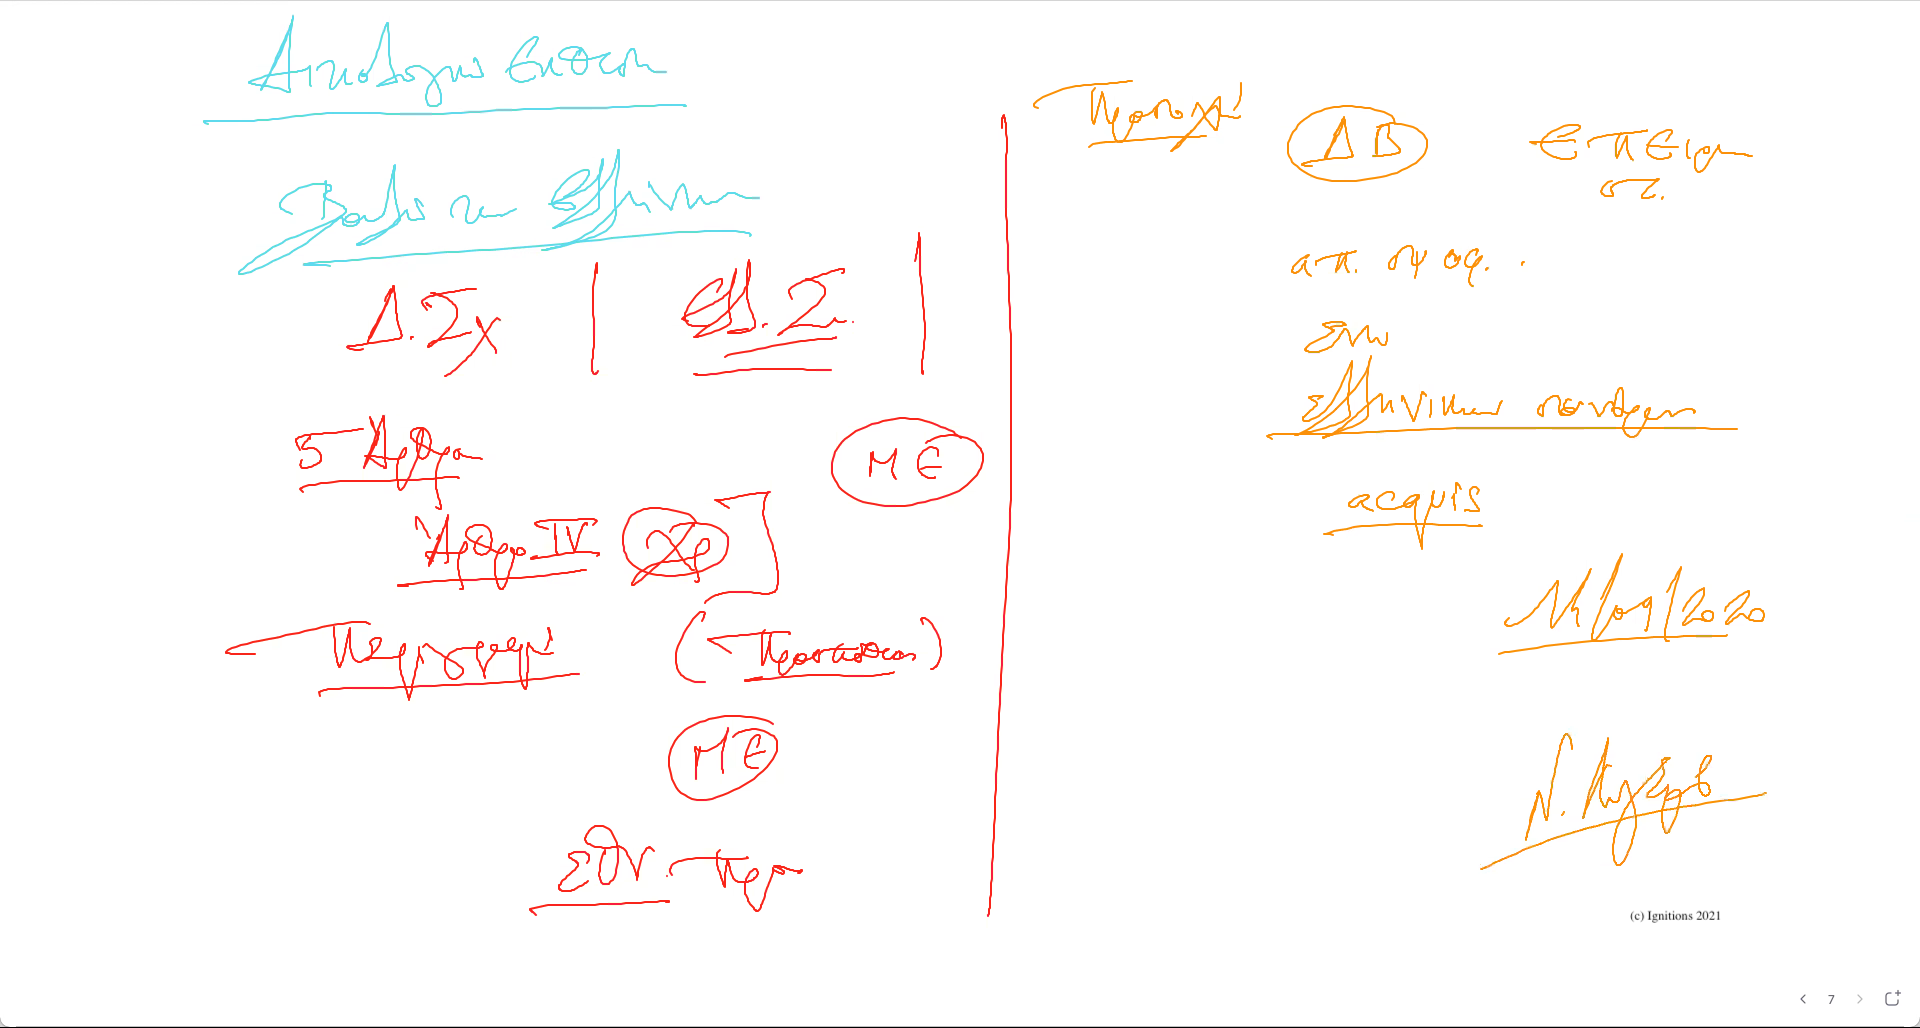 60803 - VI - Στρατηγική ανάλυση Μνημονίου Συνεργασίας. ΔΙΑΡΚΕΙΑ VΙΙ. (Dessin)